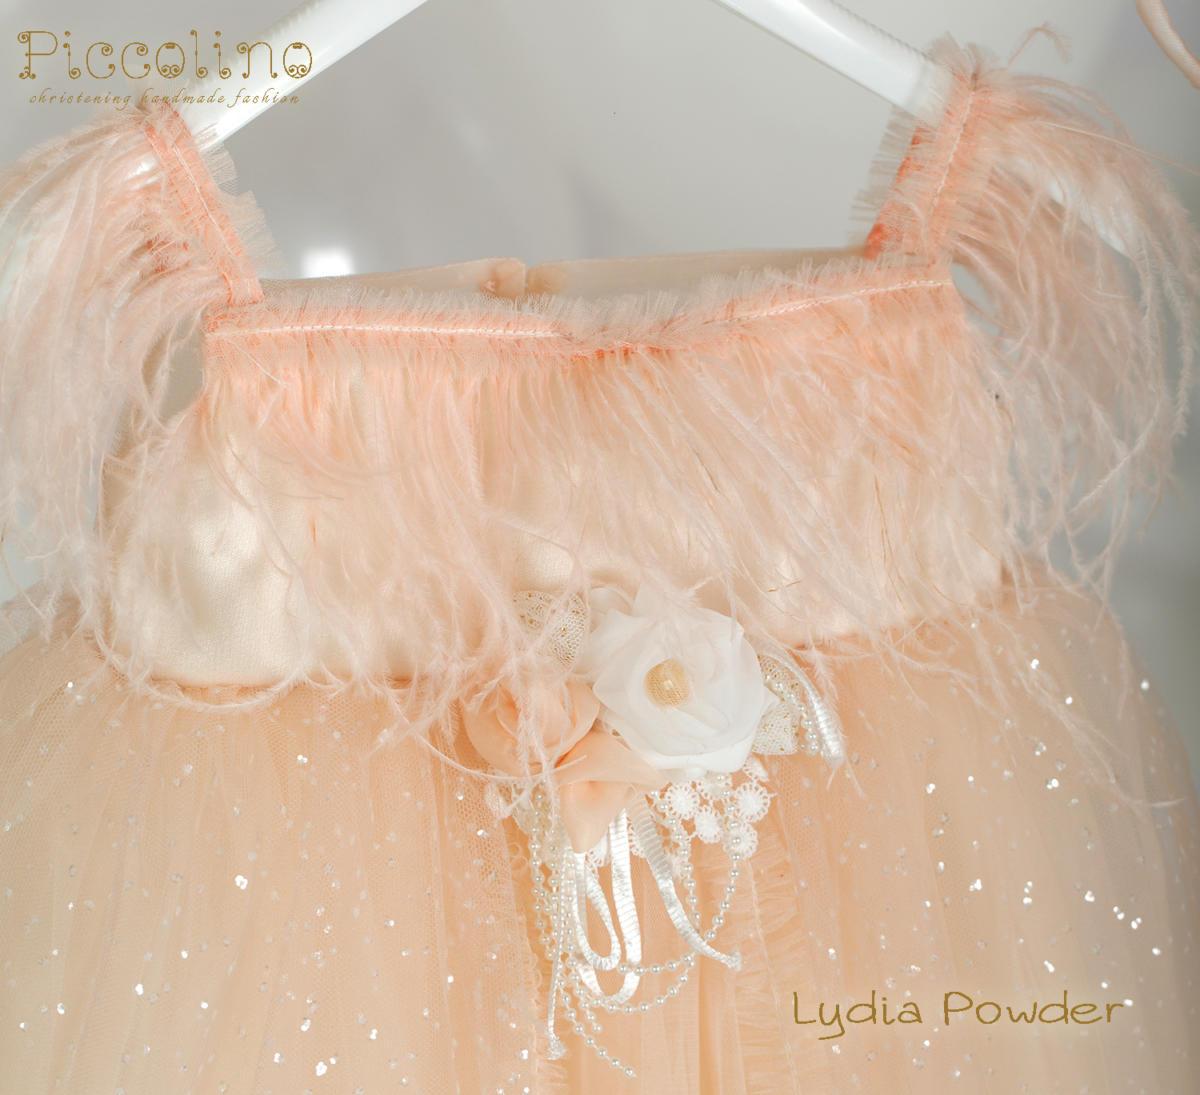 DR20S09 LYDIA POWDER DETAIL 1 LOGO